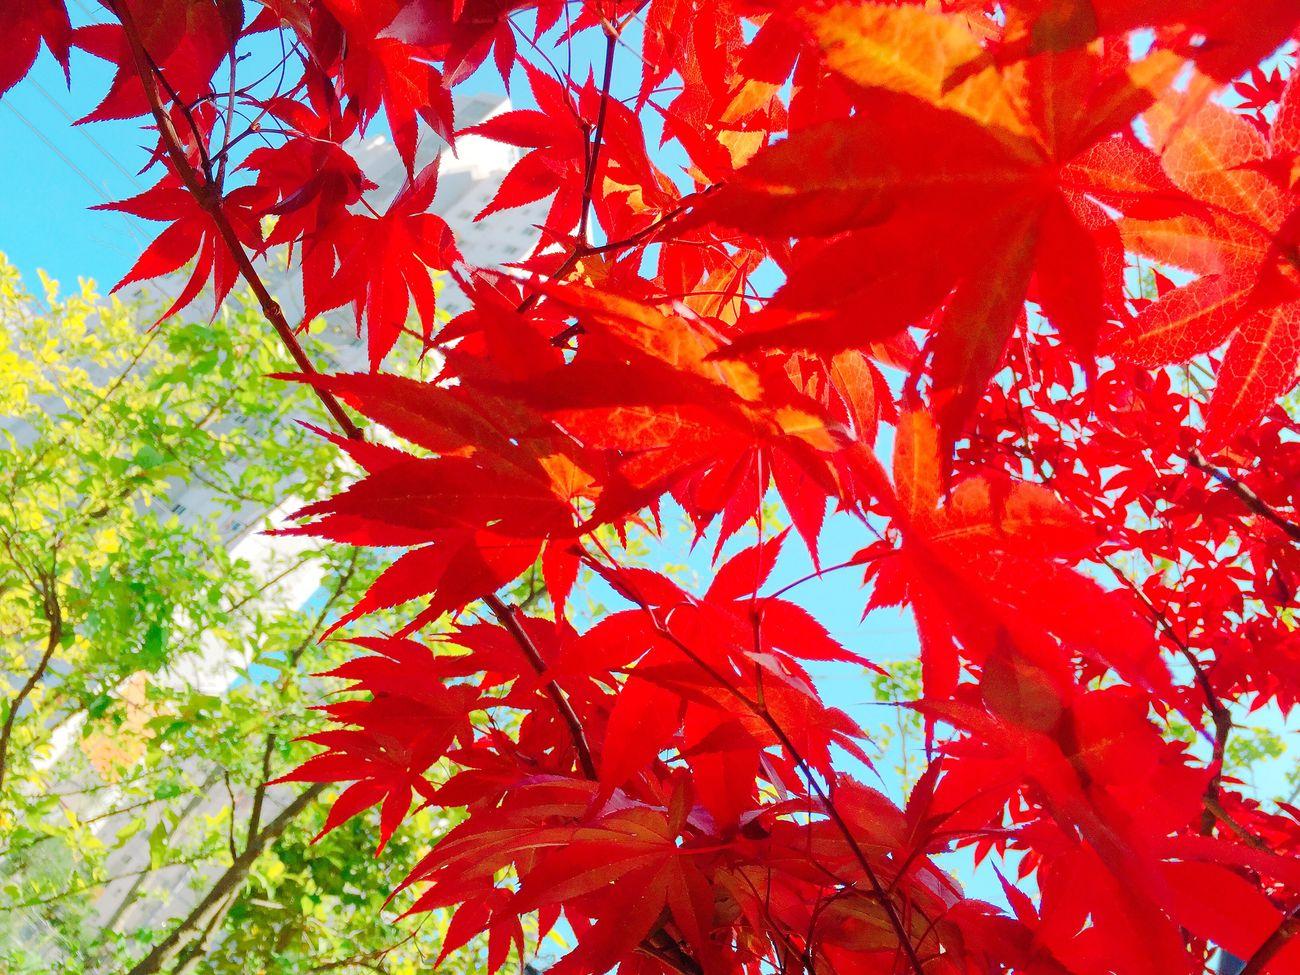 Iphone6 Autumn Nature 아이폰6 단풍 자연